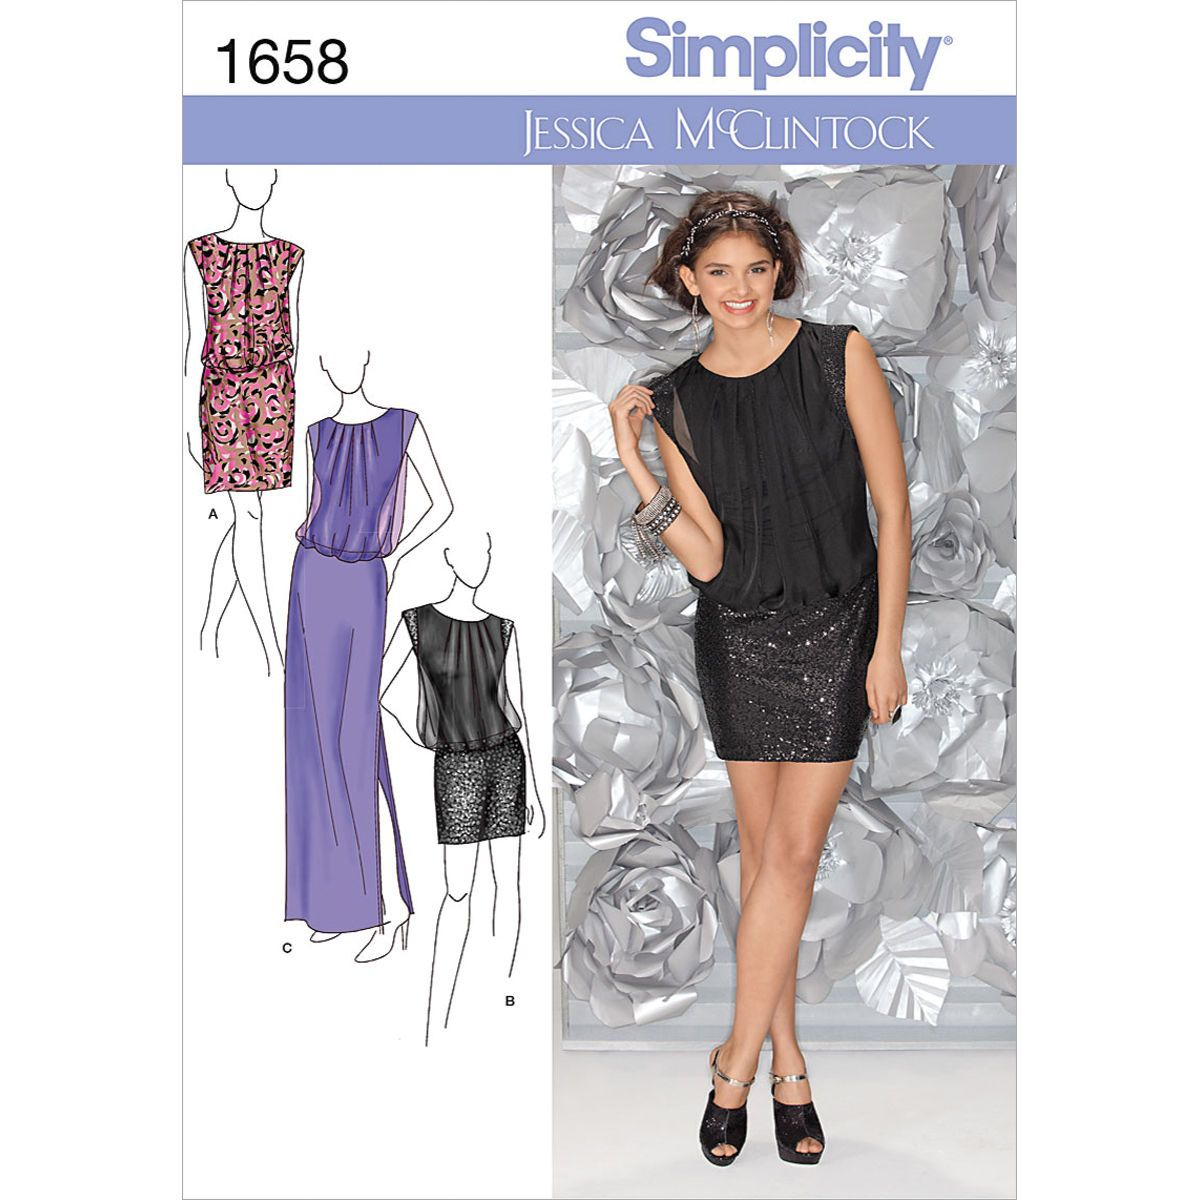 Simplicity Pattern 1658R5 14 - 16 - 18 - 2 - Simplicity Misses Sp